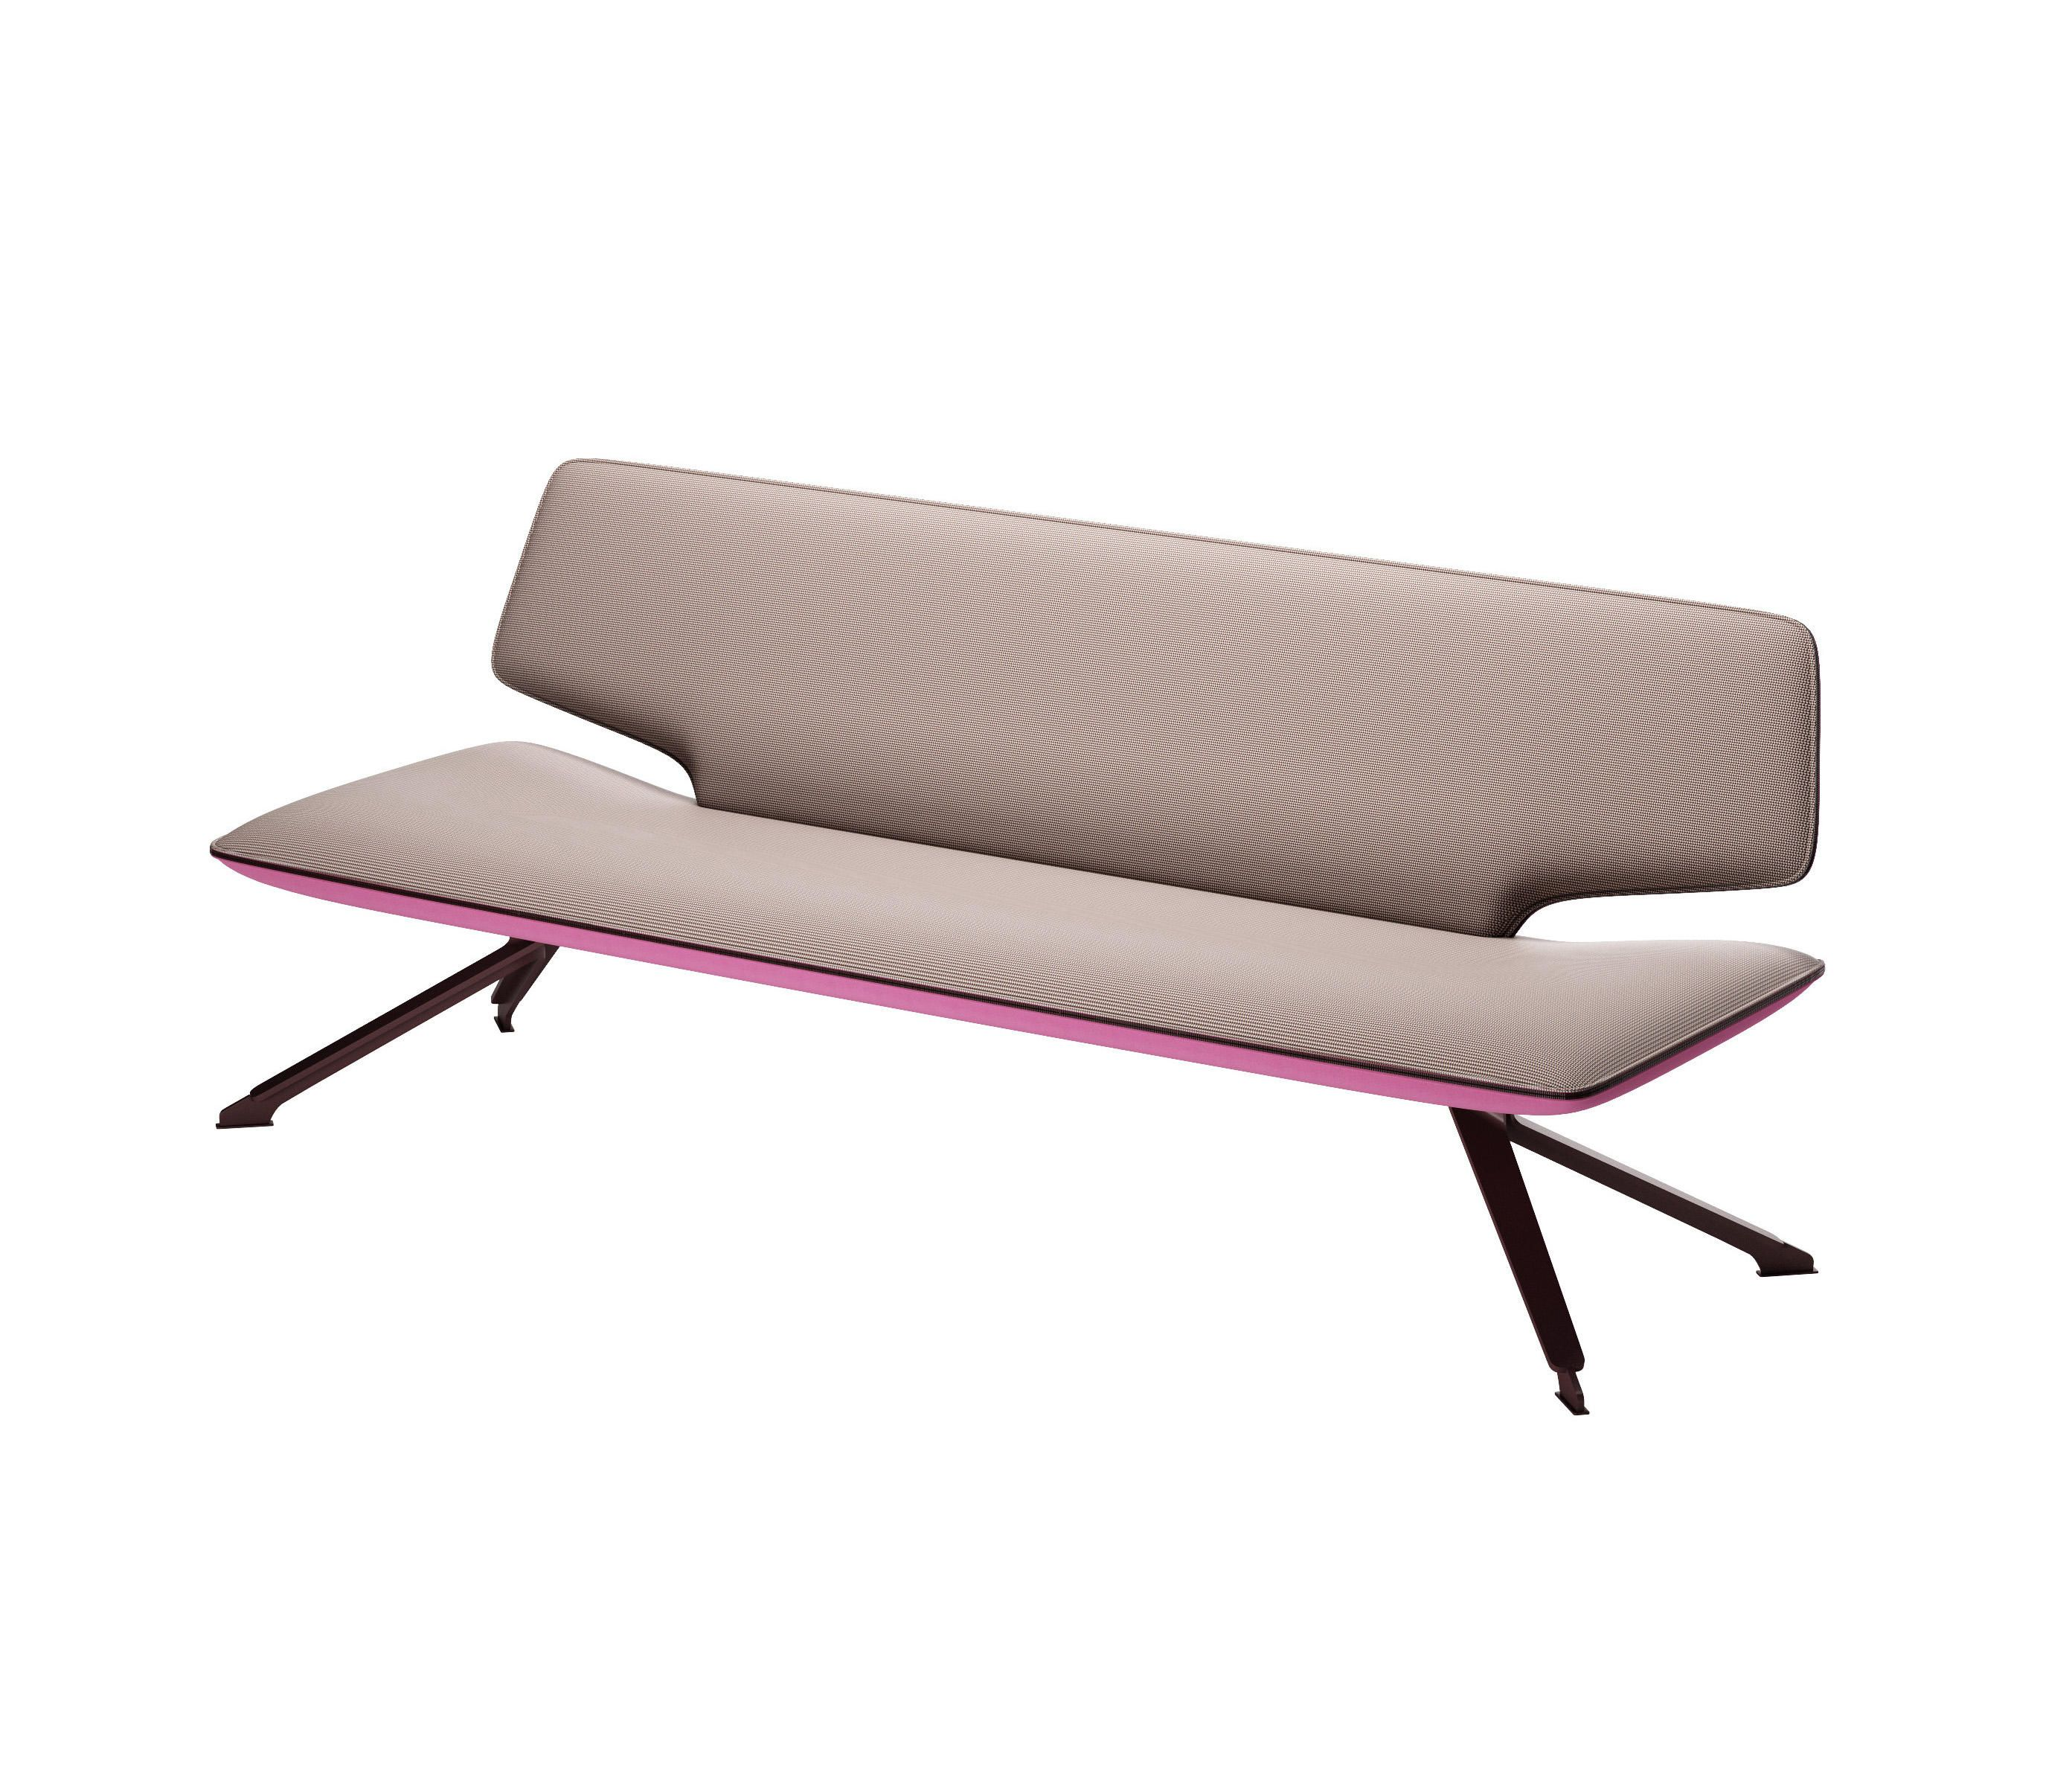 TT3 Low Soft 610 By Alias | Lounge Sofas